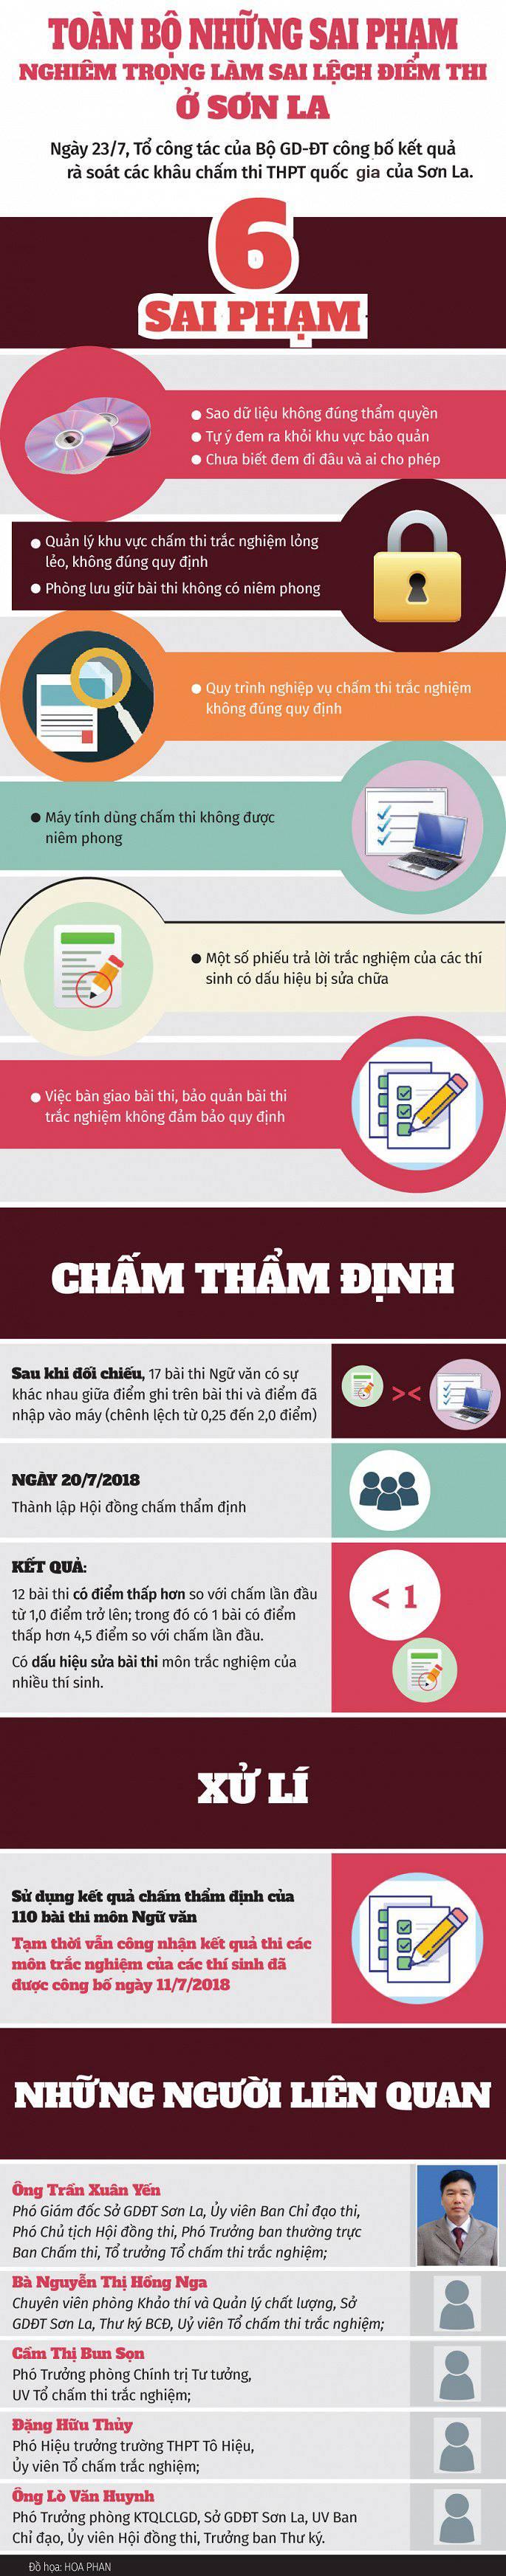 Infographic: Sai pham nghiem trong cua Pho GD So GD-DT va 4 can bo lam sai lech diem thi o Son La hinh anh 1